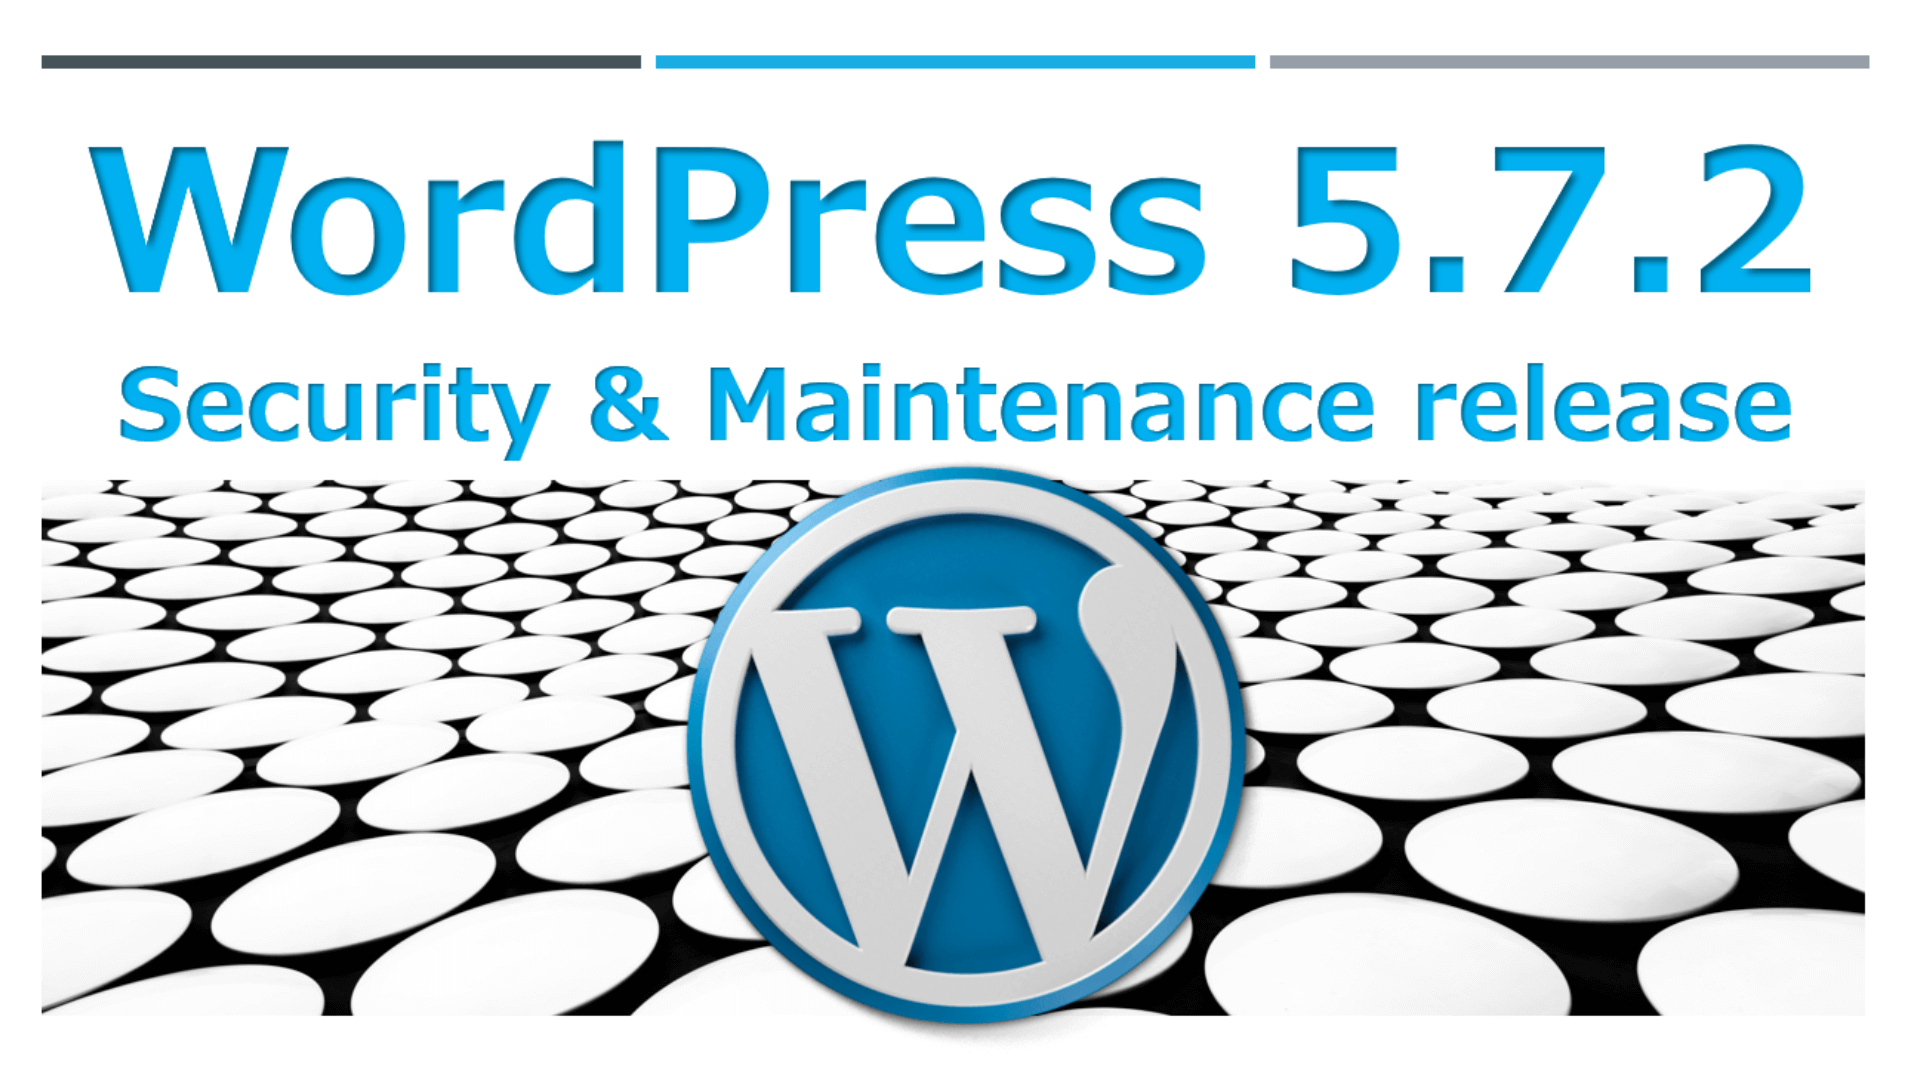 WordPrtess 5.7.2